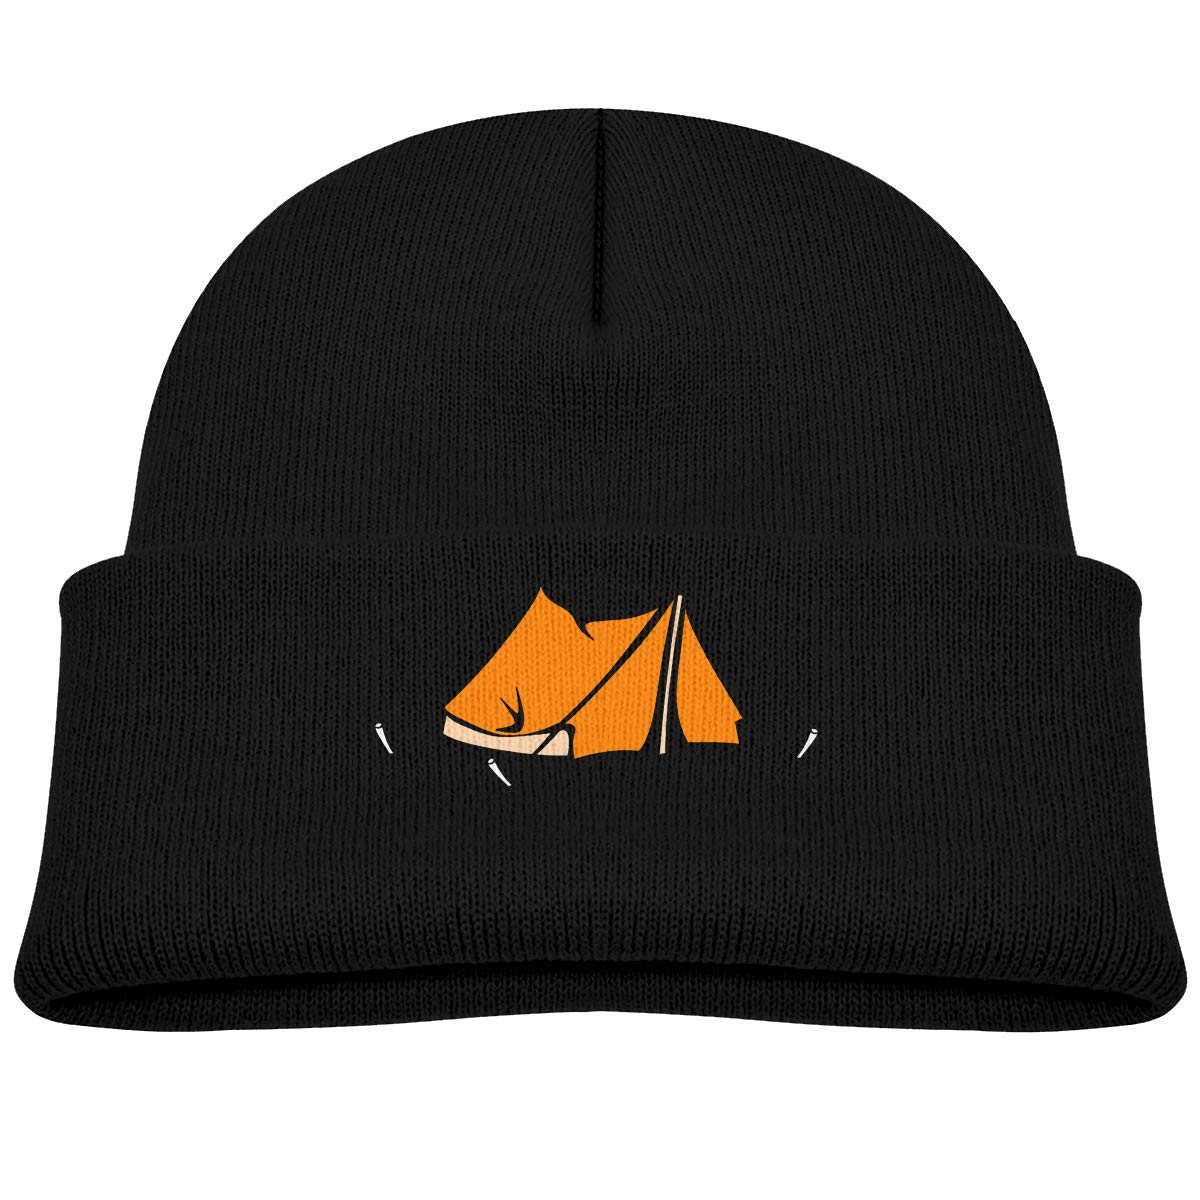 Happy Camper Kids Knitted Beanies Hat Winter Cap Warm Hat